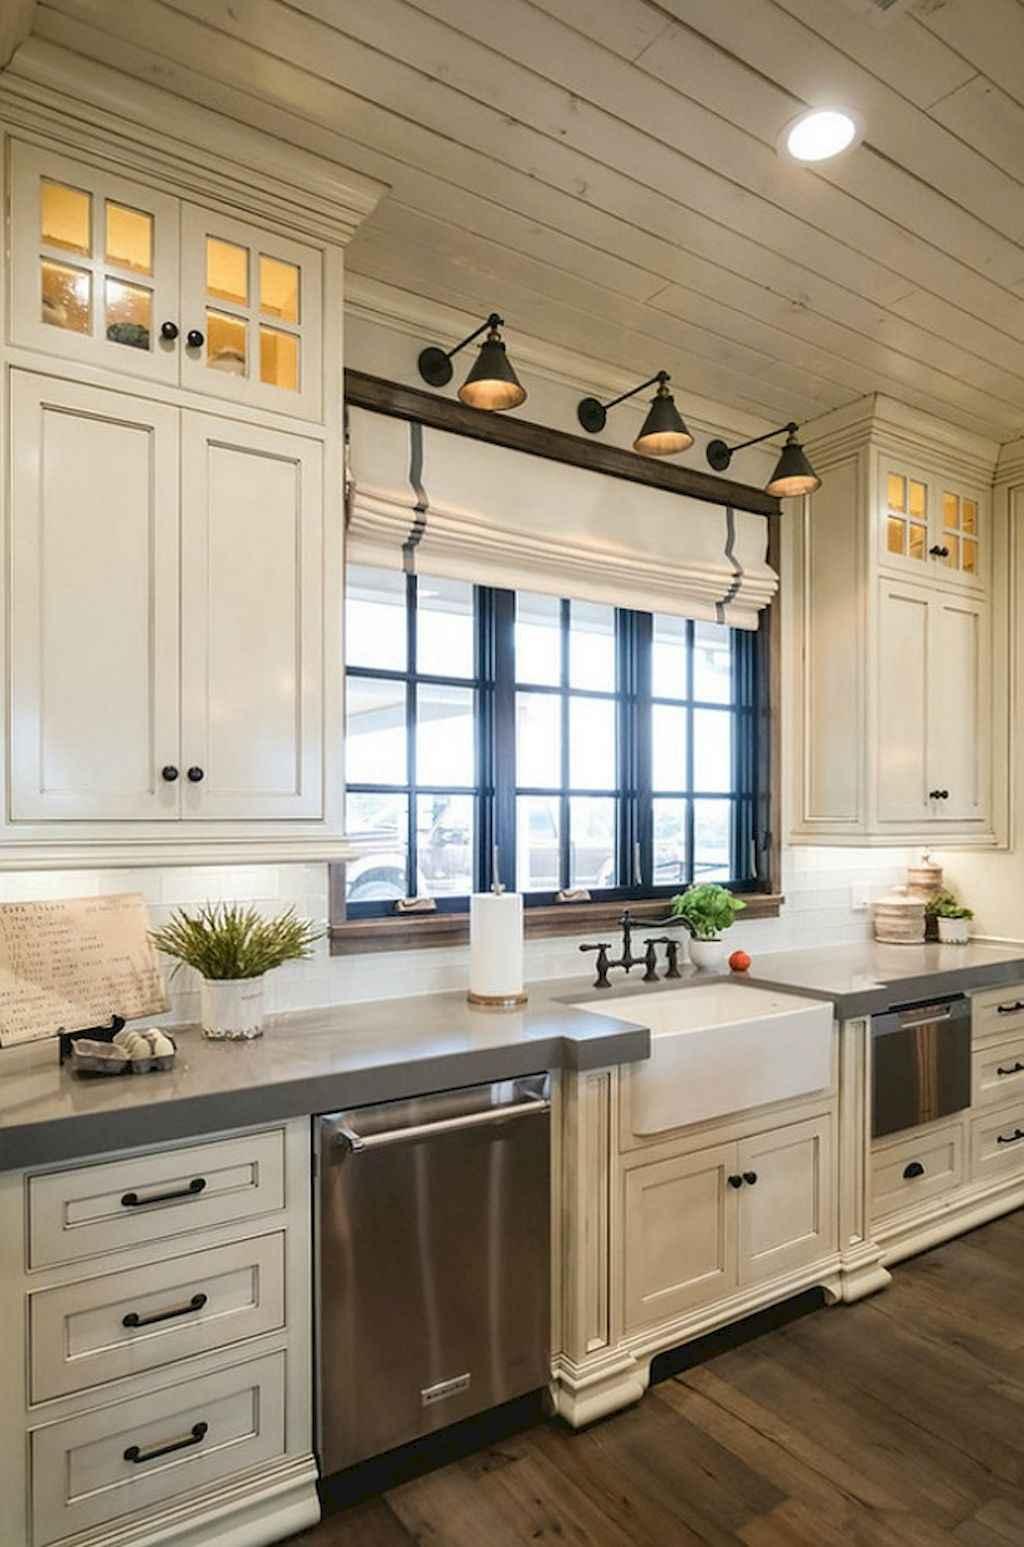 90 Rustic Kitchen Cabinets Farmhouse Style Ideas 76